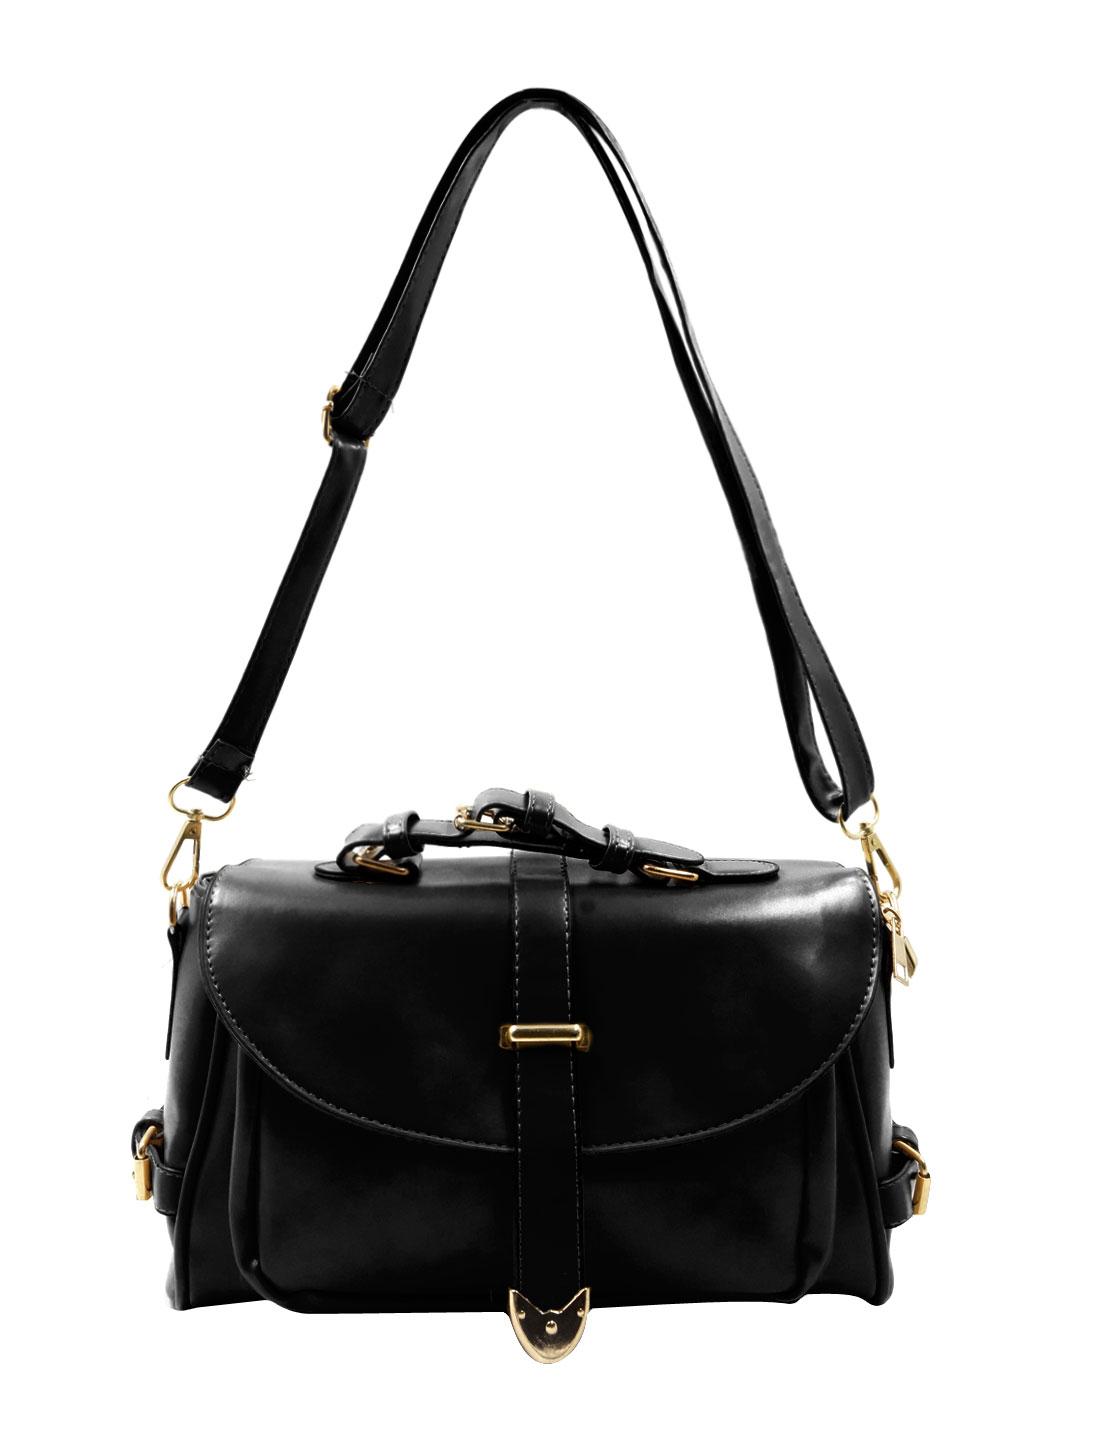 Woman Imiatation Leather Functional Pockets Clutch Shoulder Bag Black